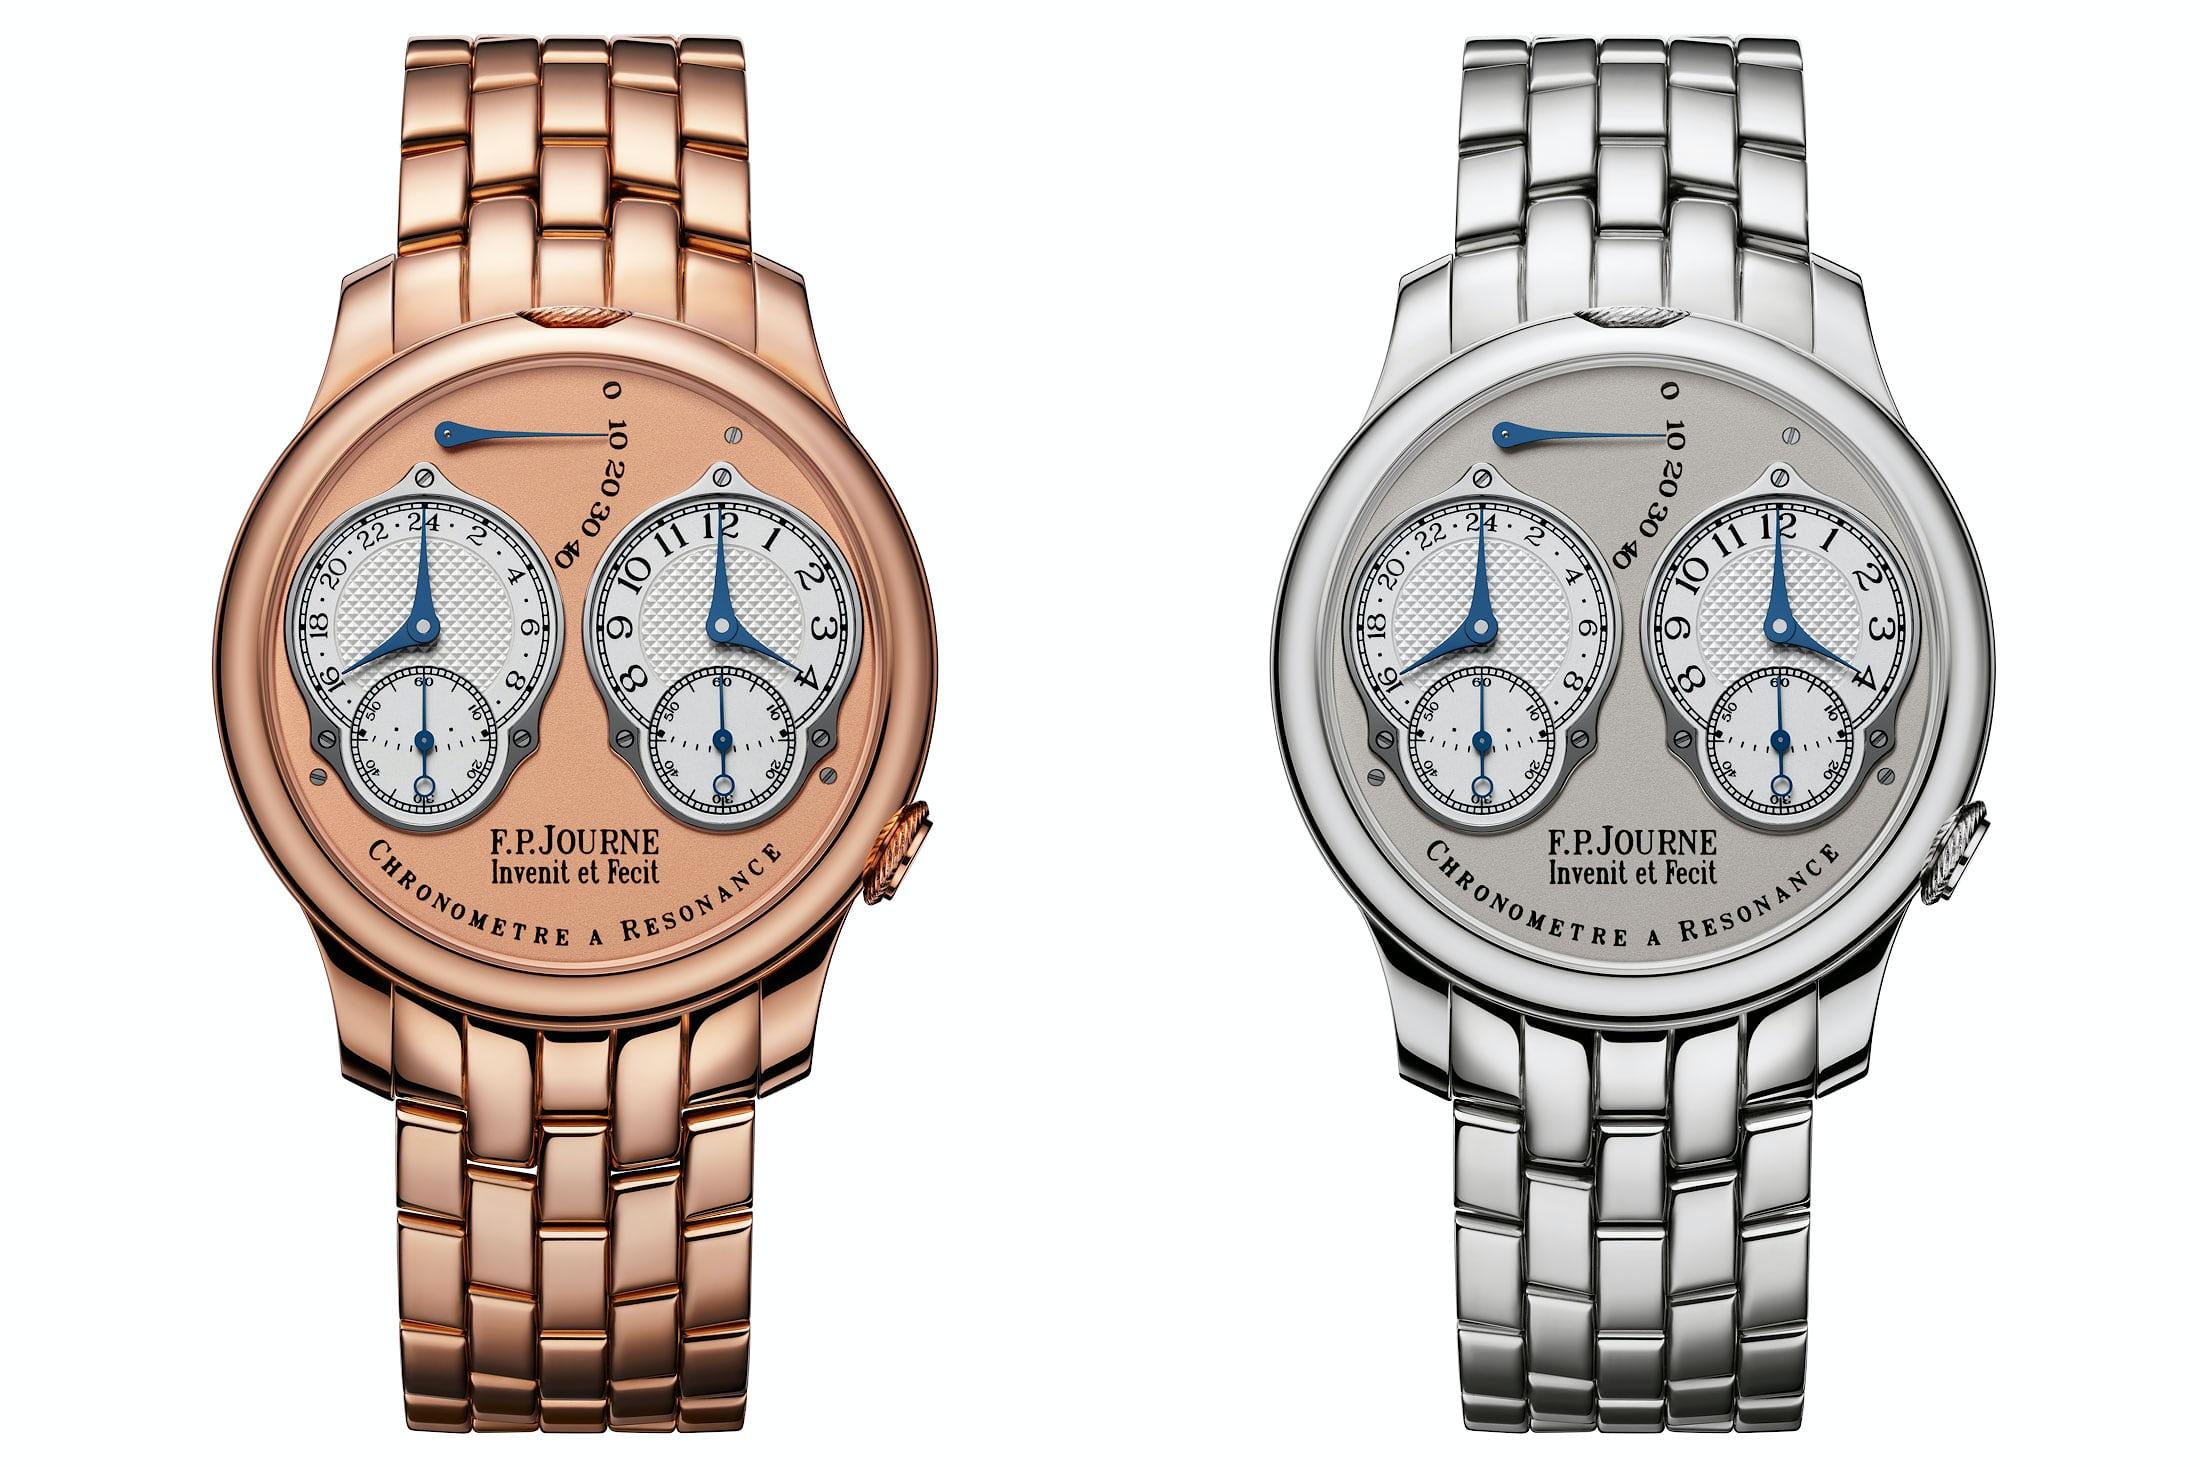 fp-journe-chronometre-a-resonance-gold-bracelet